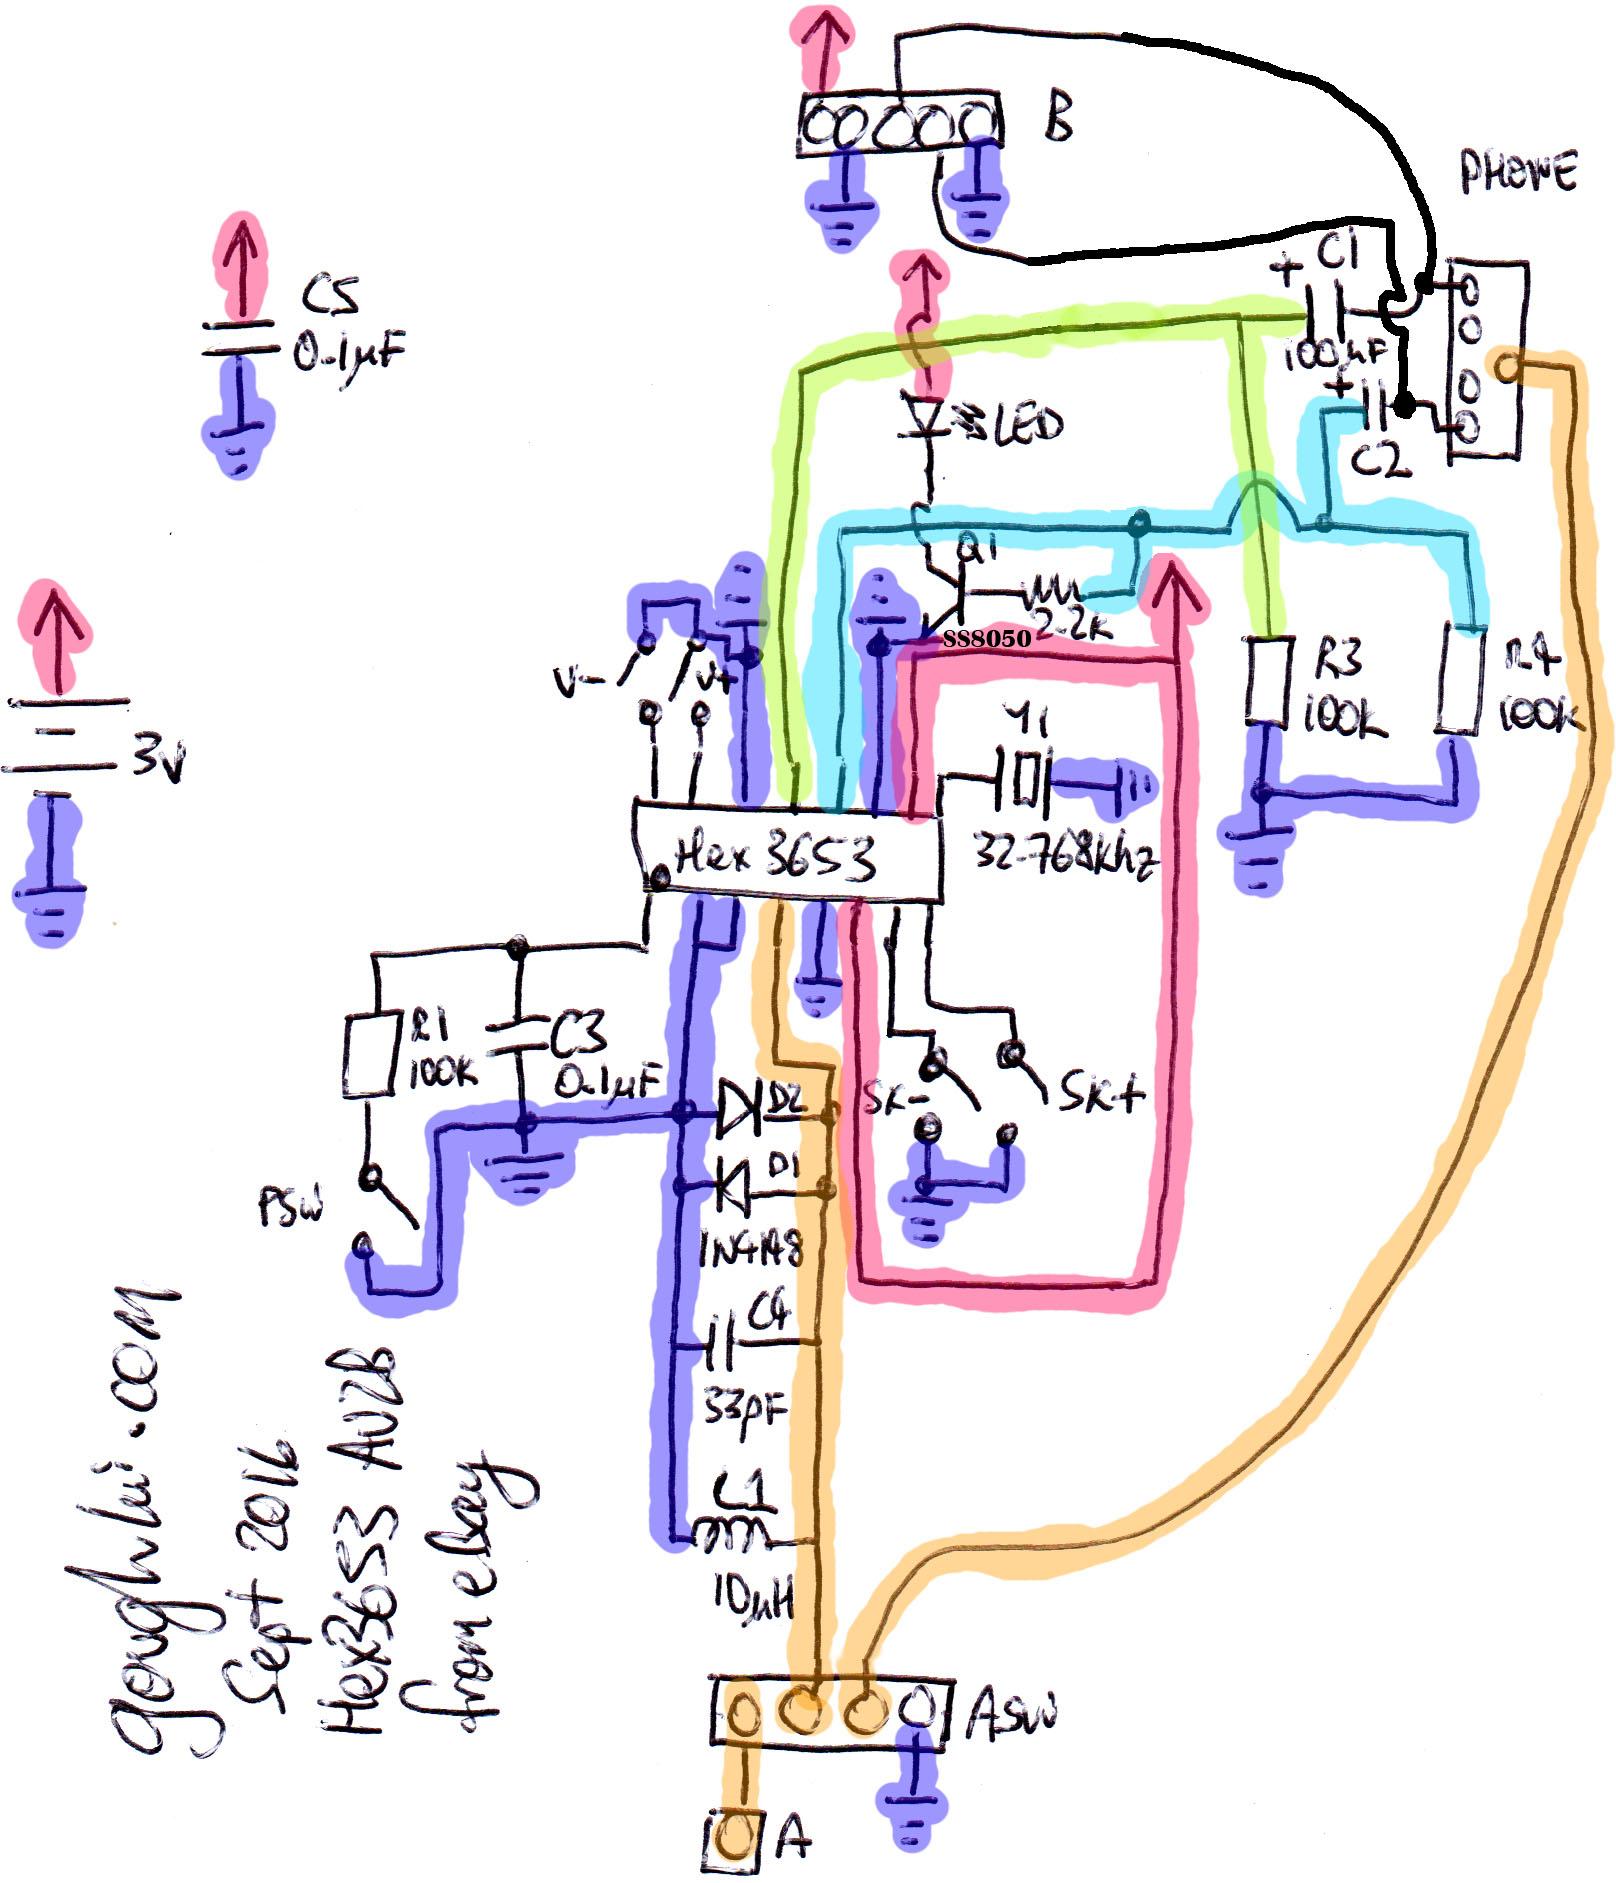 hight resolution of hex3653 schematic